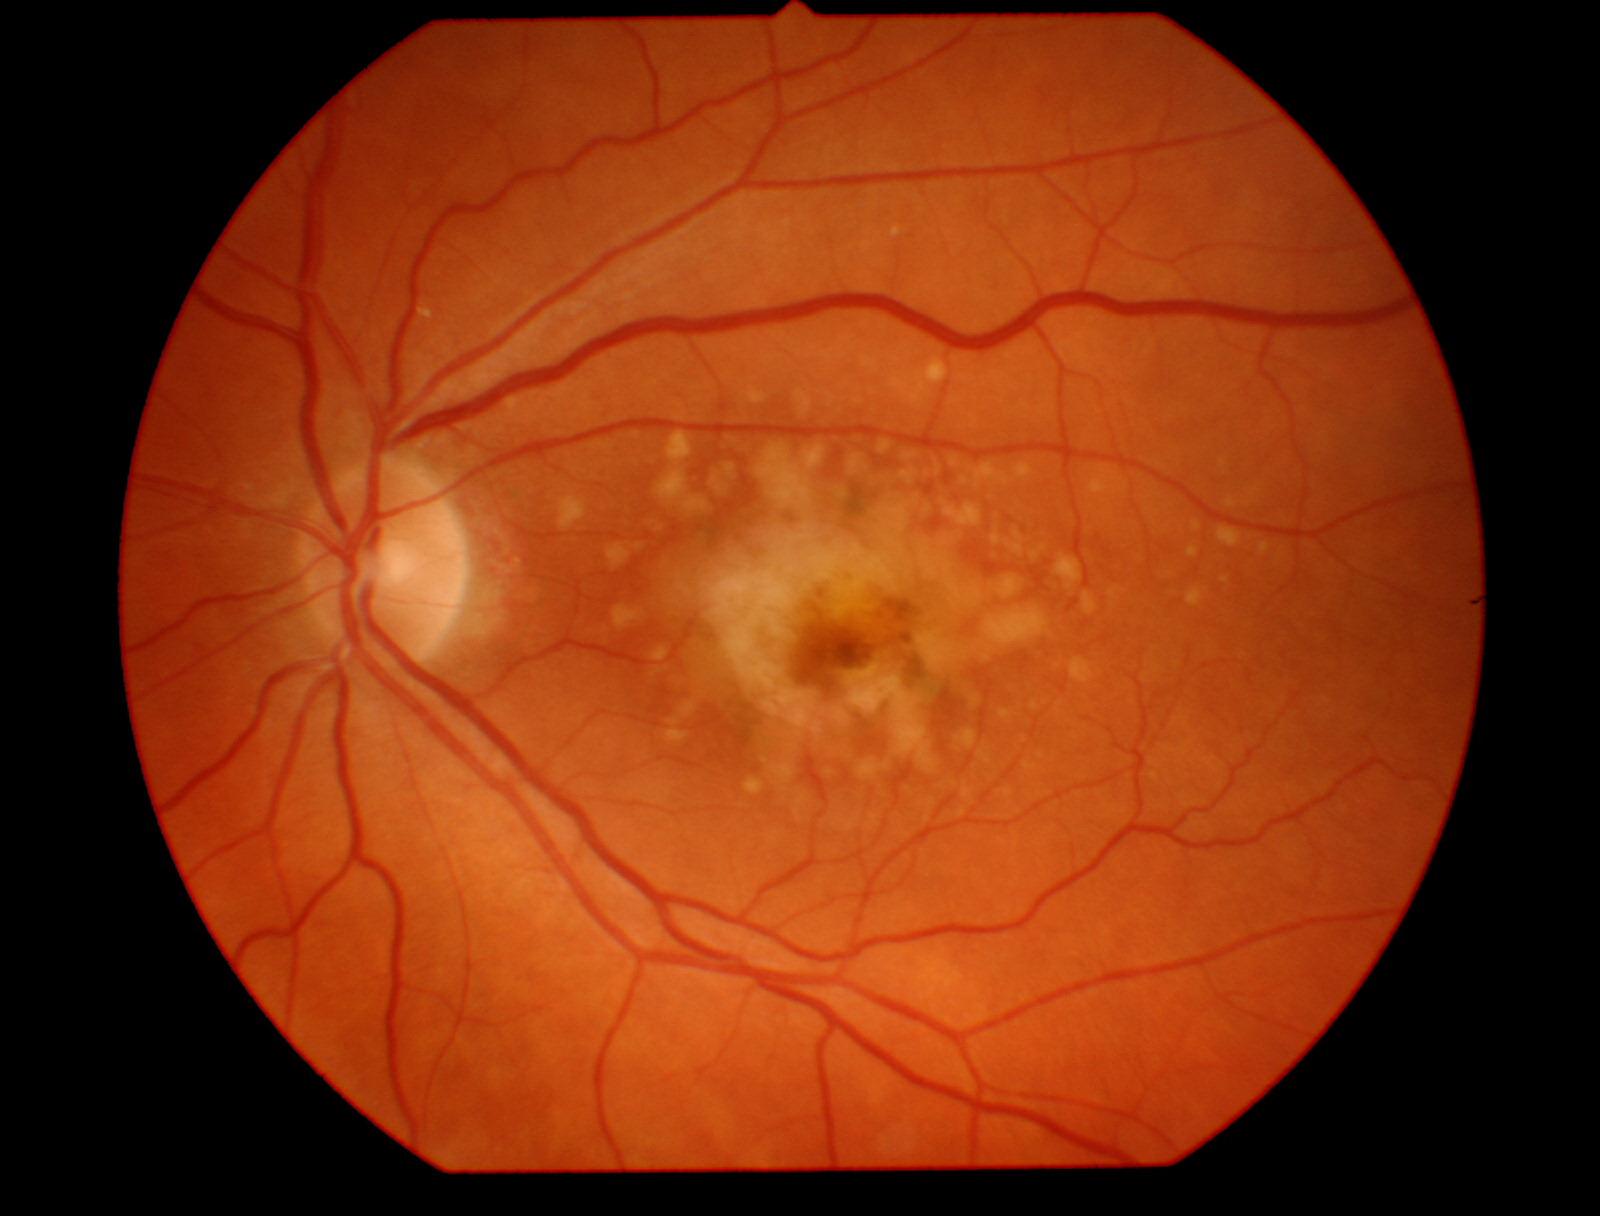 A Digital Retinal Image of Macular Degeneration